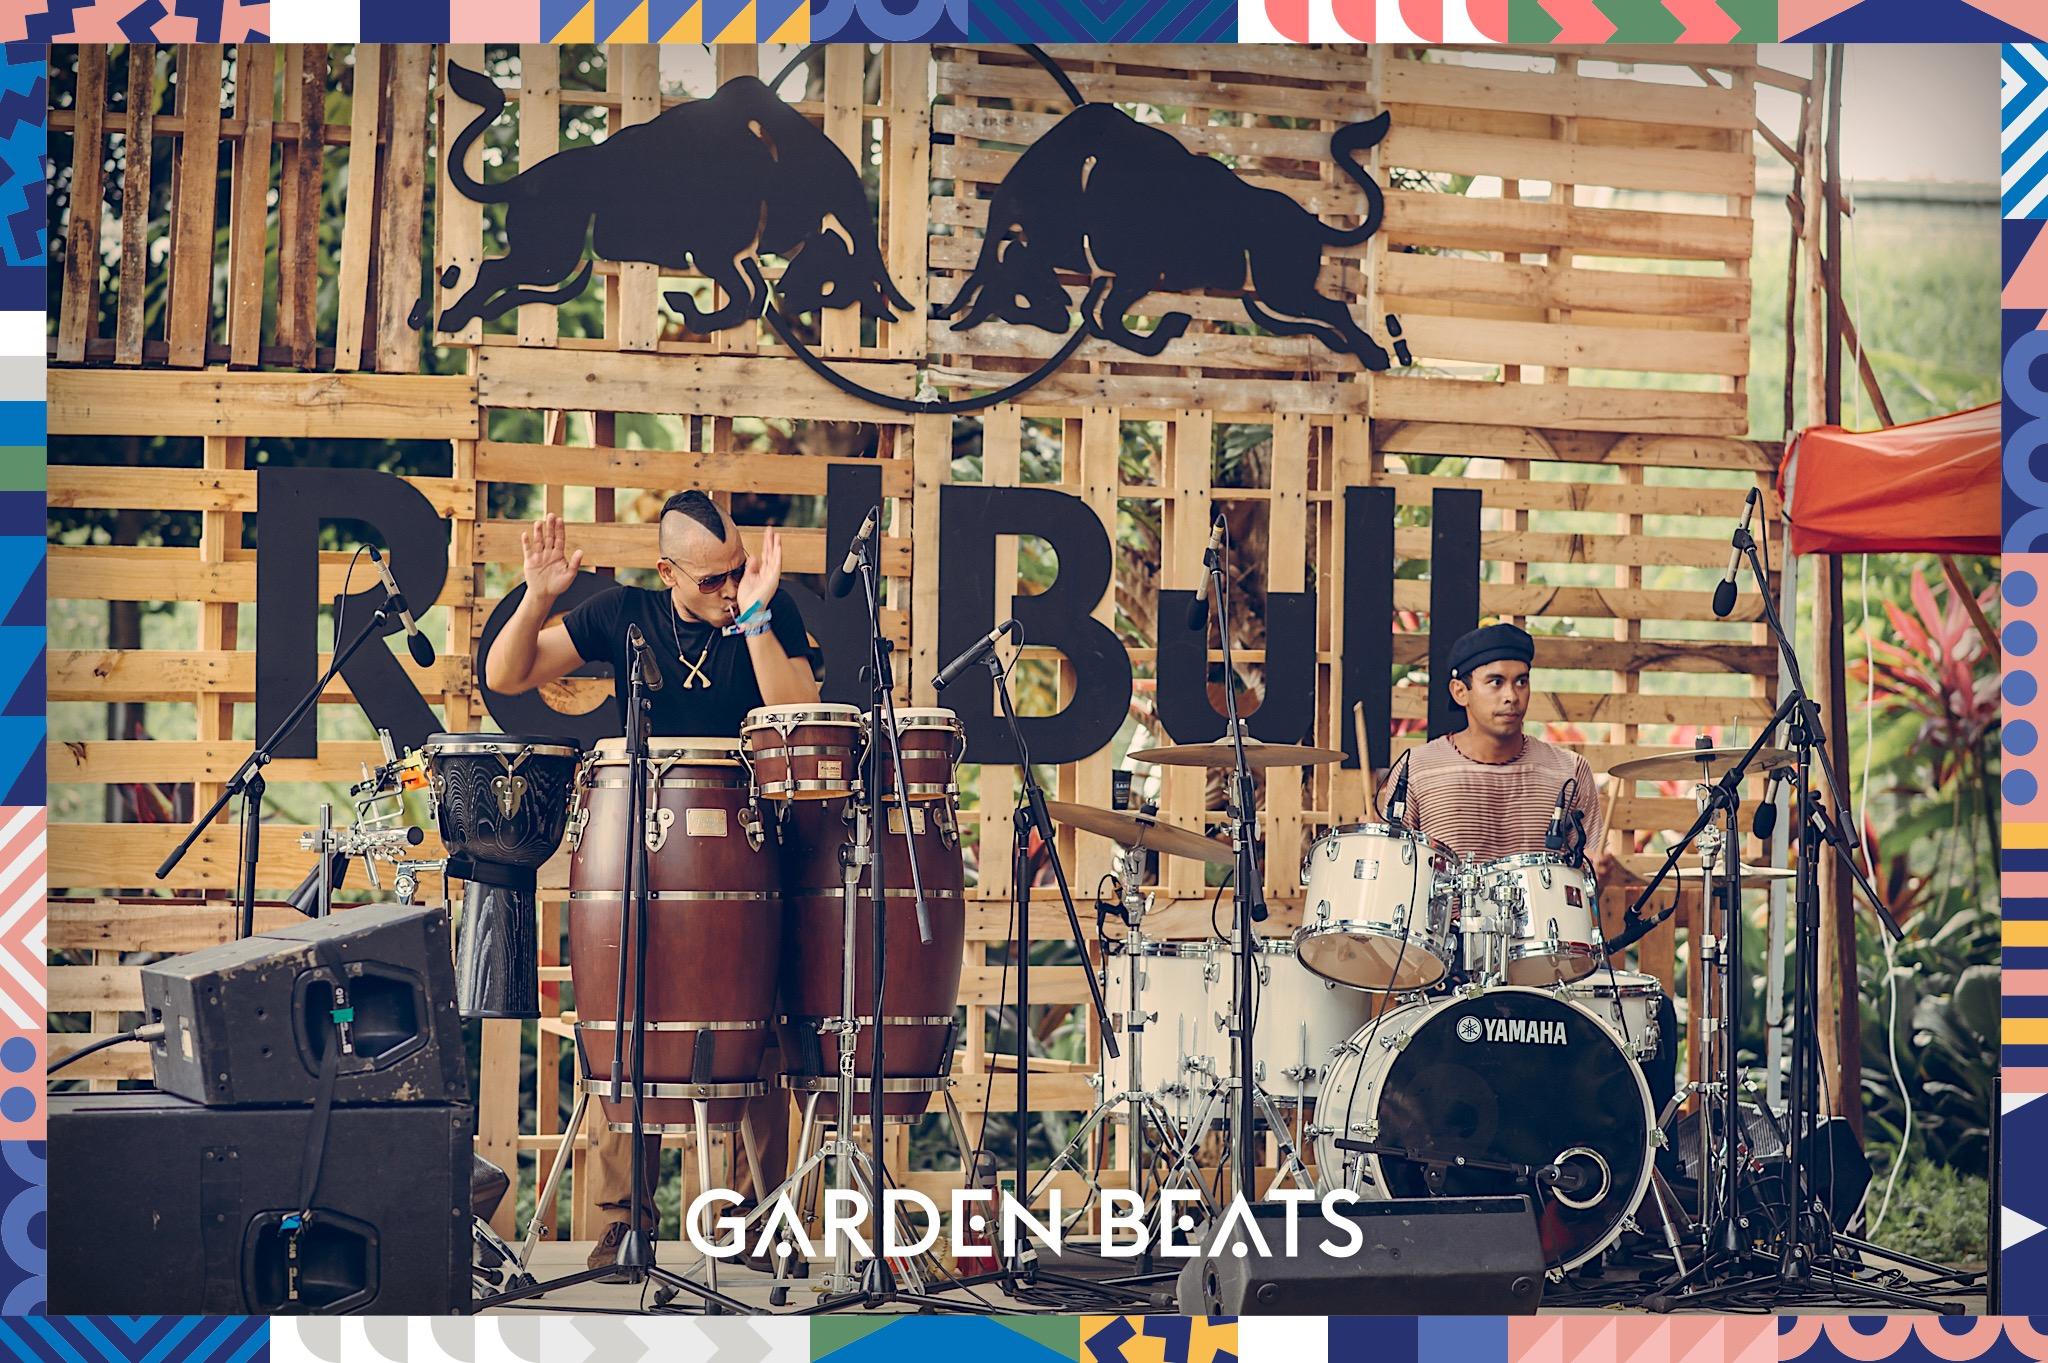 03032018_GardenBeats_Colossal359_Watermarked.jpg